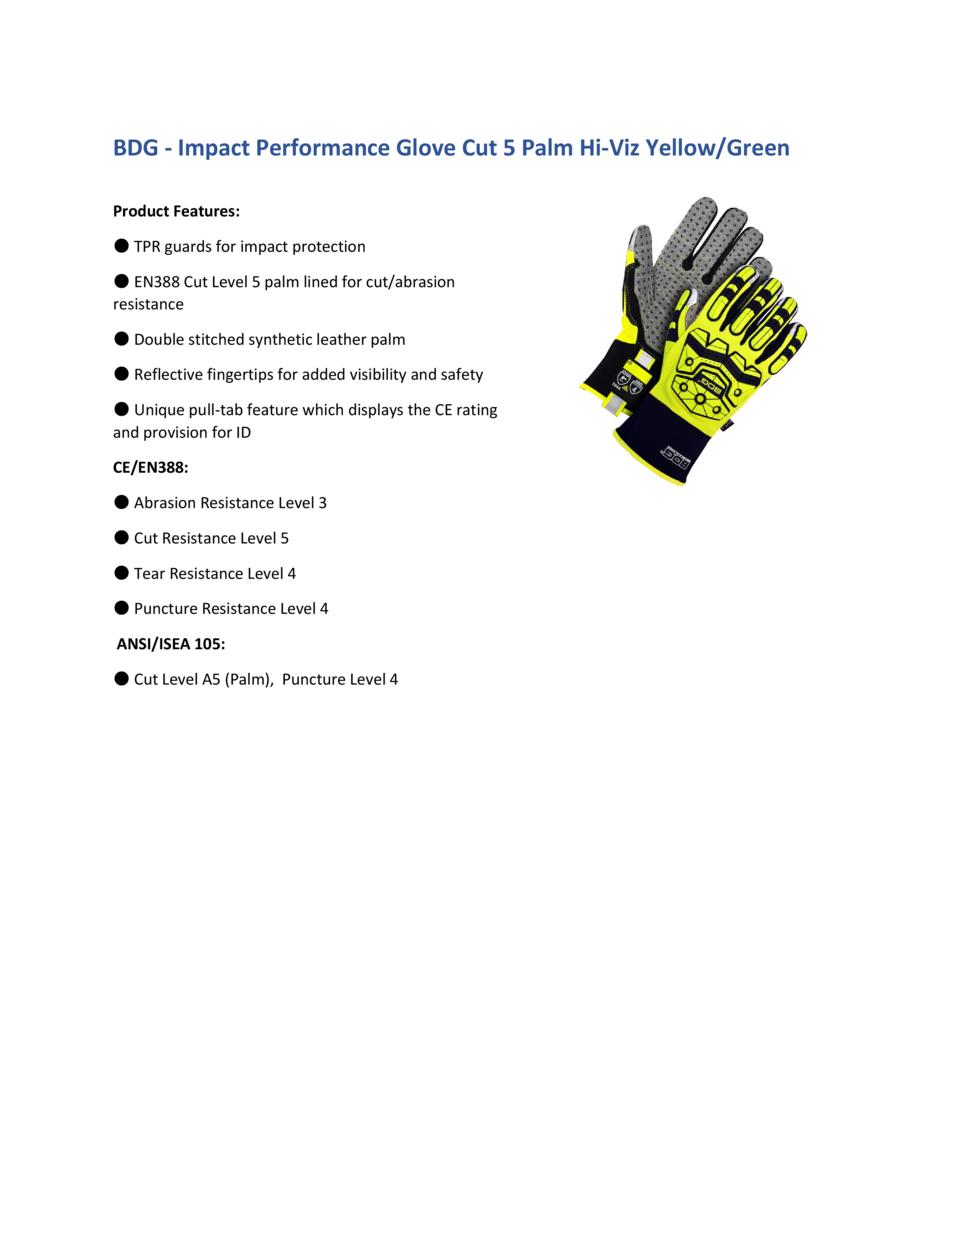 NORTON MOTORCYCLE High Visibility Hi Viz HV Vest Yellow VARIOUS Sizes